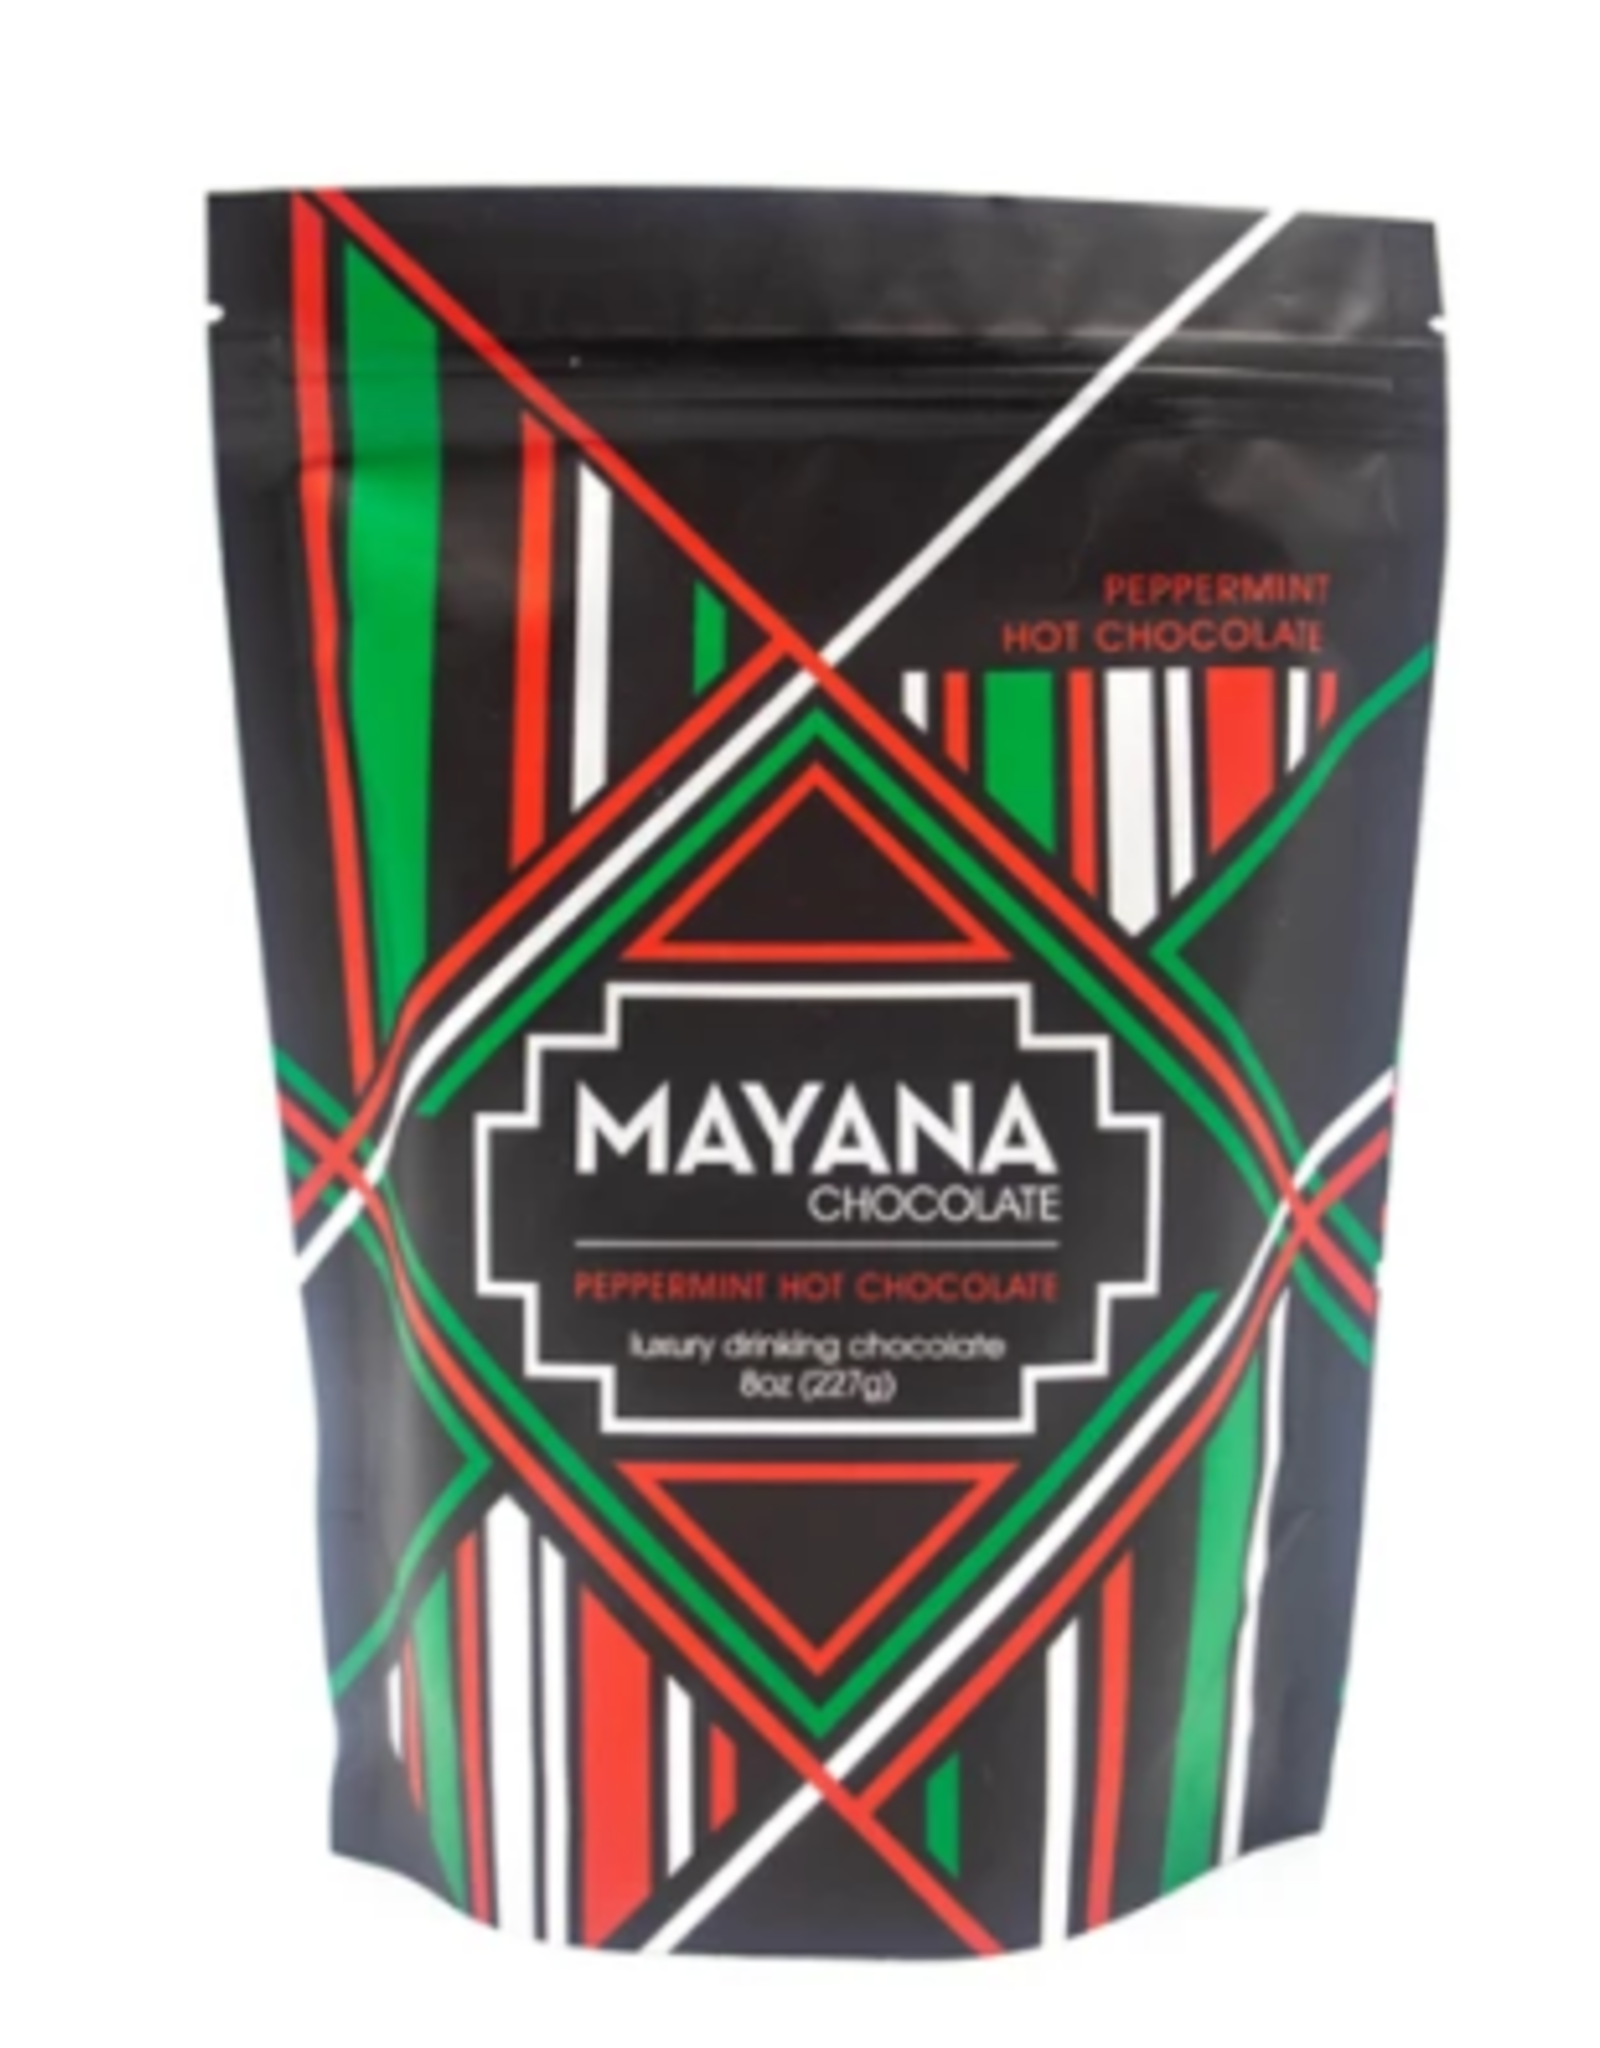 Mayana Chocolate Mayana Hot Chocolate, Peppermint